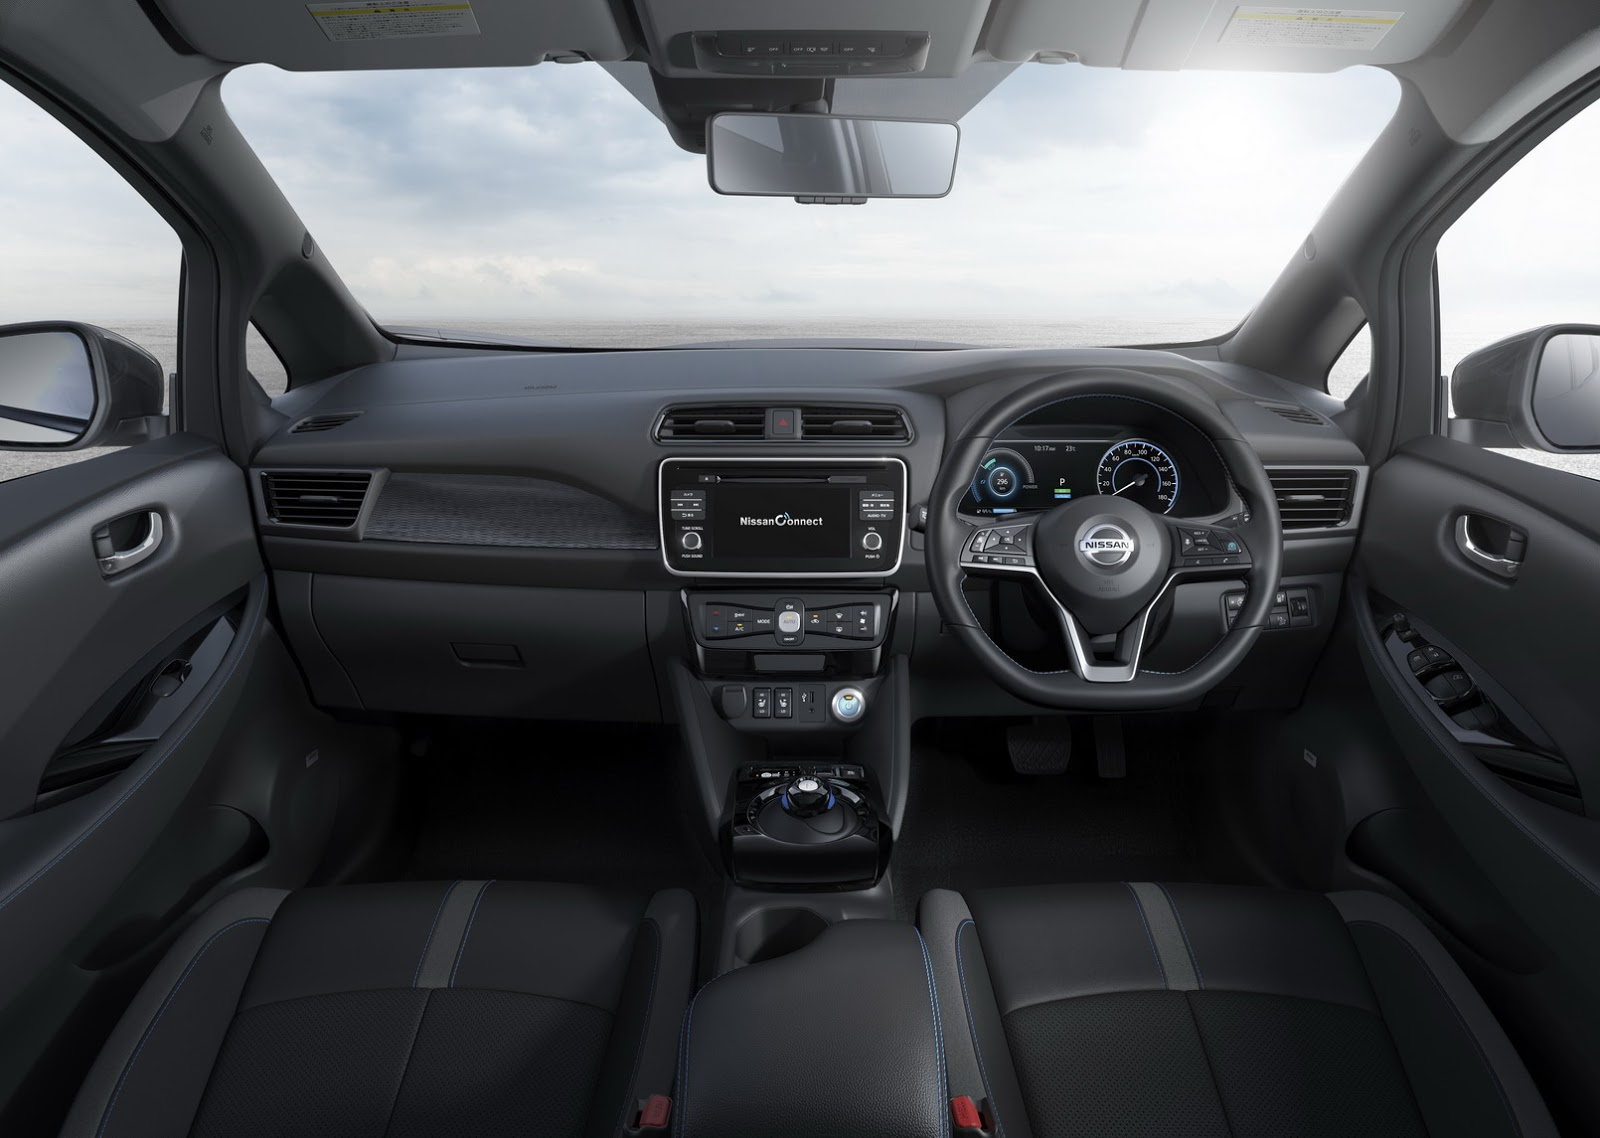 Nissan Leaf 2018 EU (26)